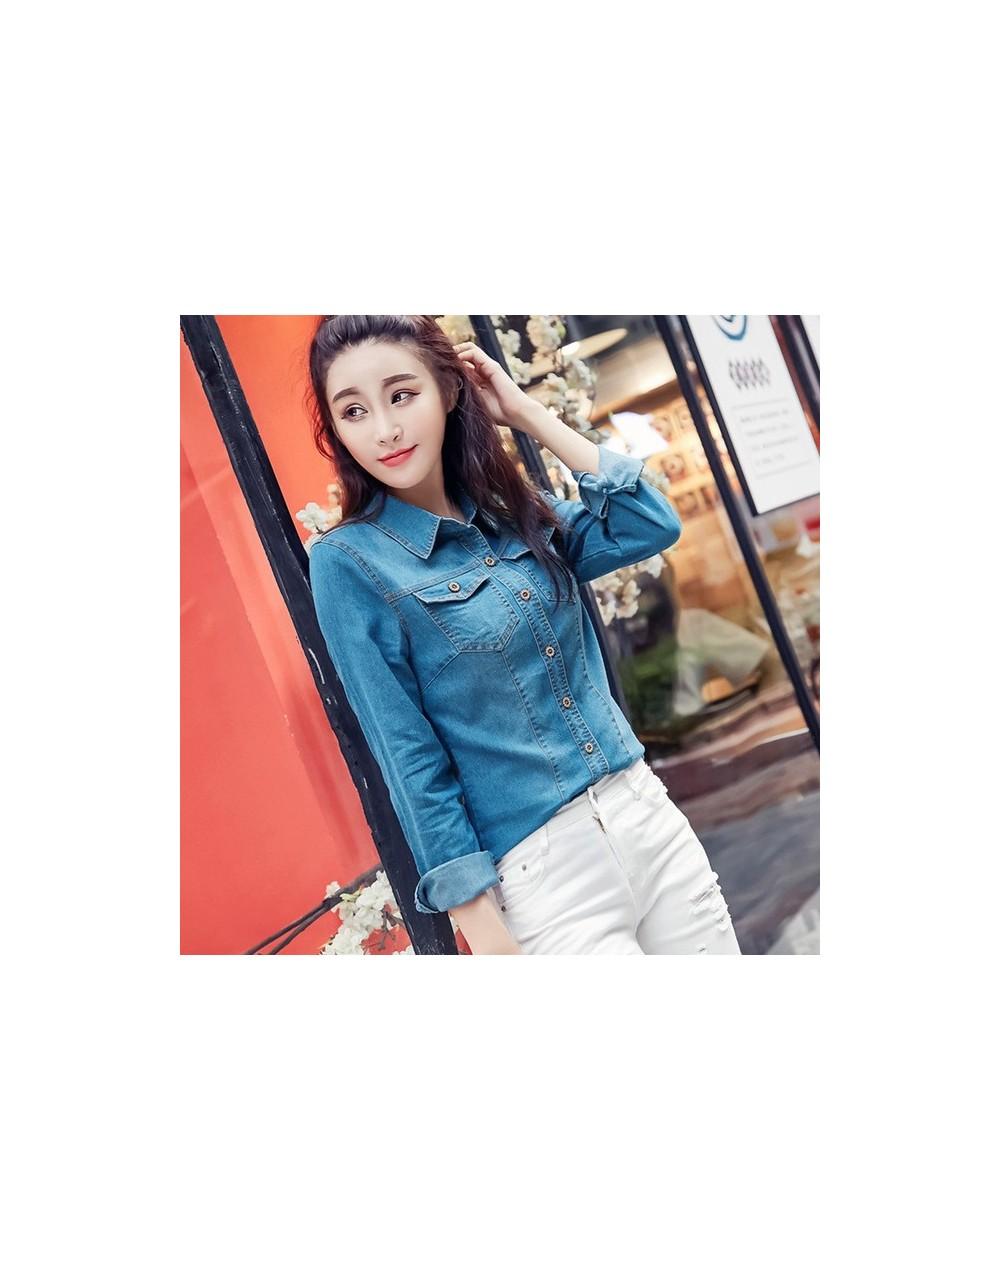 Jeans Shirt women 2019 Long Sleeve Slim Casual Vintage Elastic Ladies Denim Shirts Tops Blusas Feminina Woman Blouses and To...